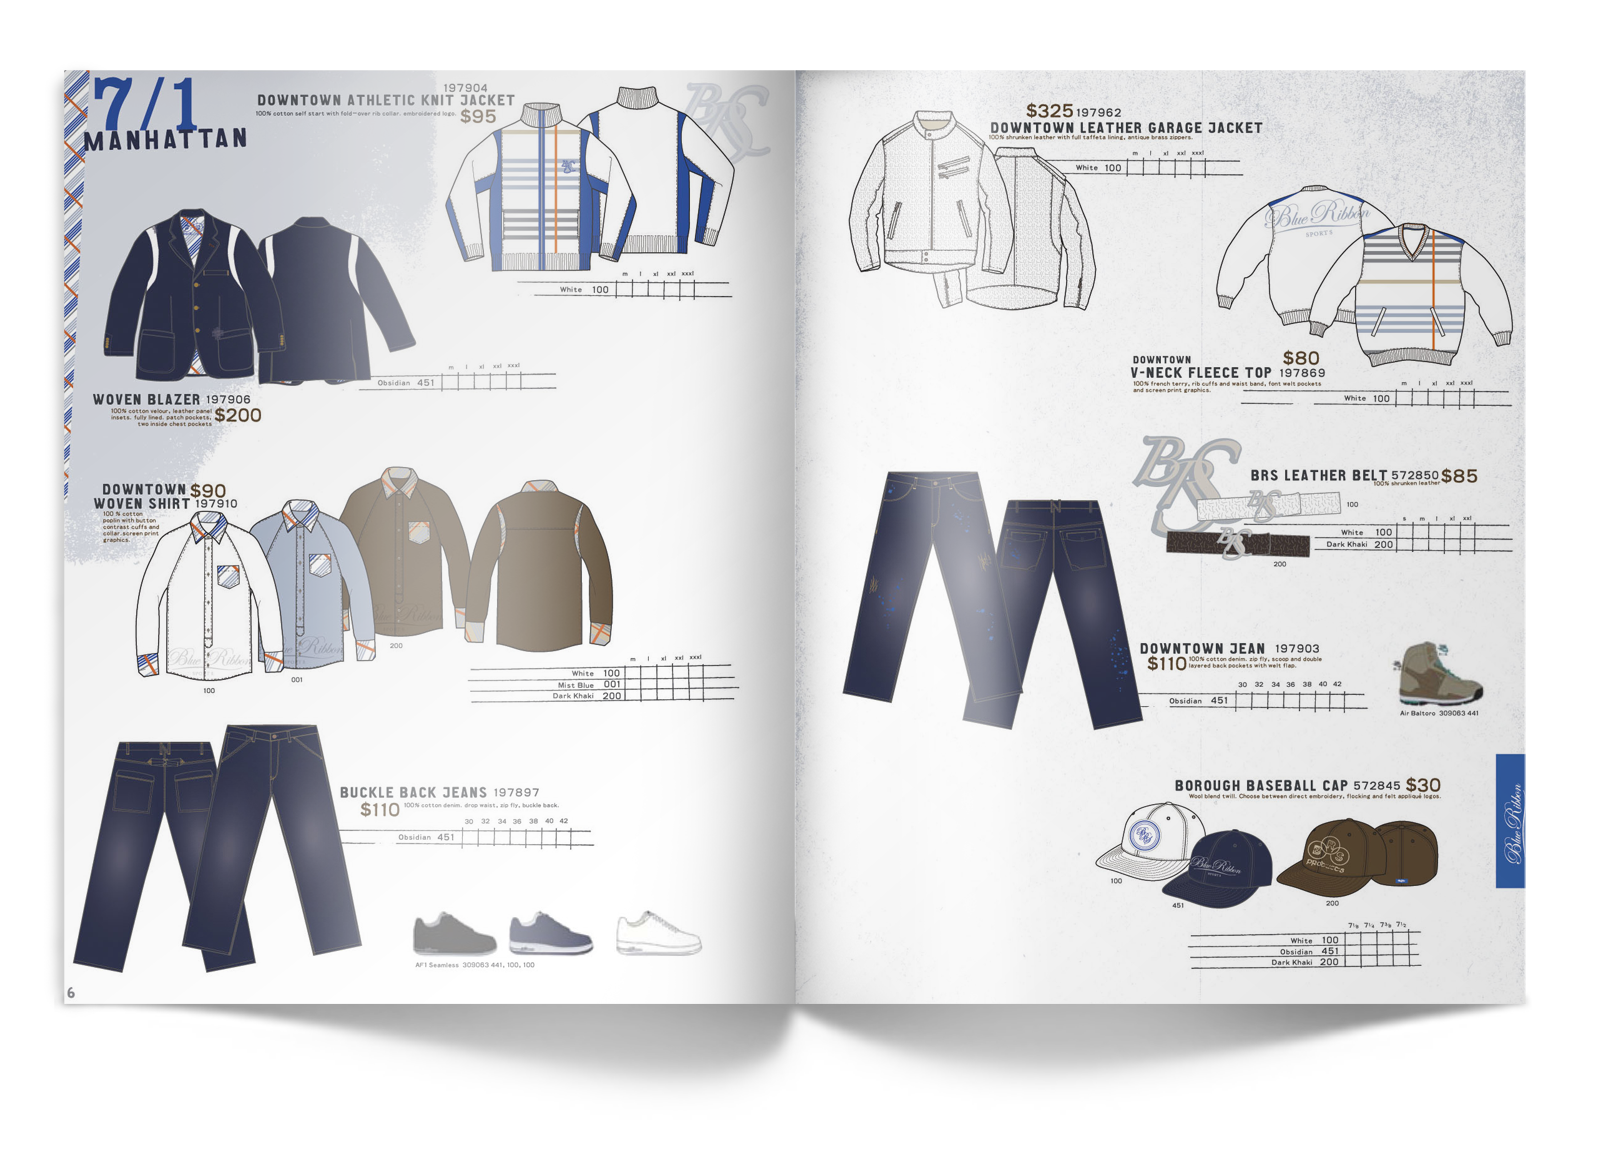 BRS_catalog_0002_manhattan-product-1.png